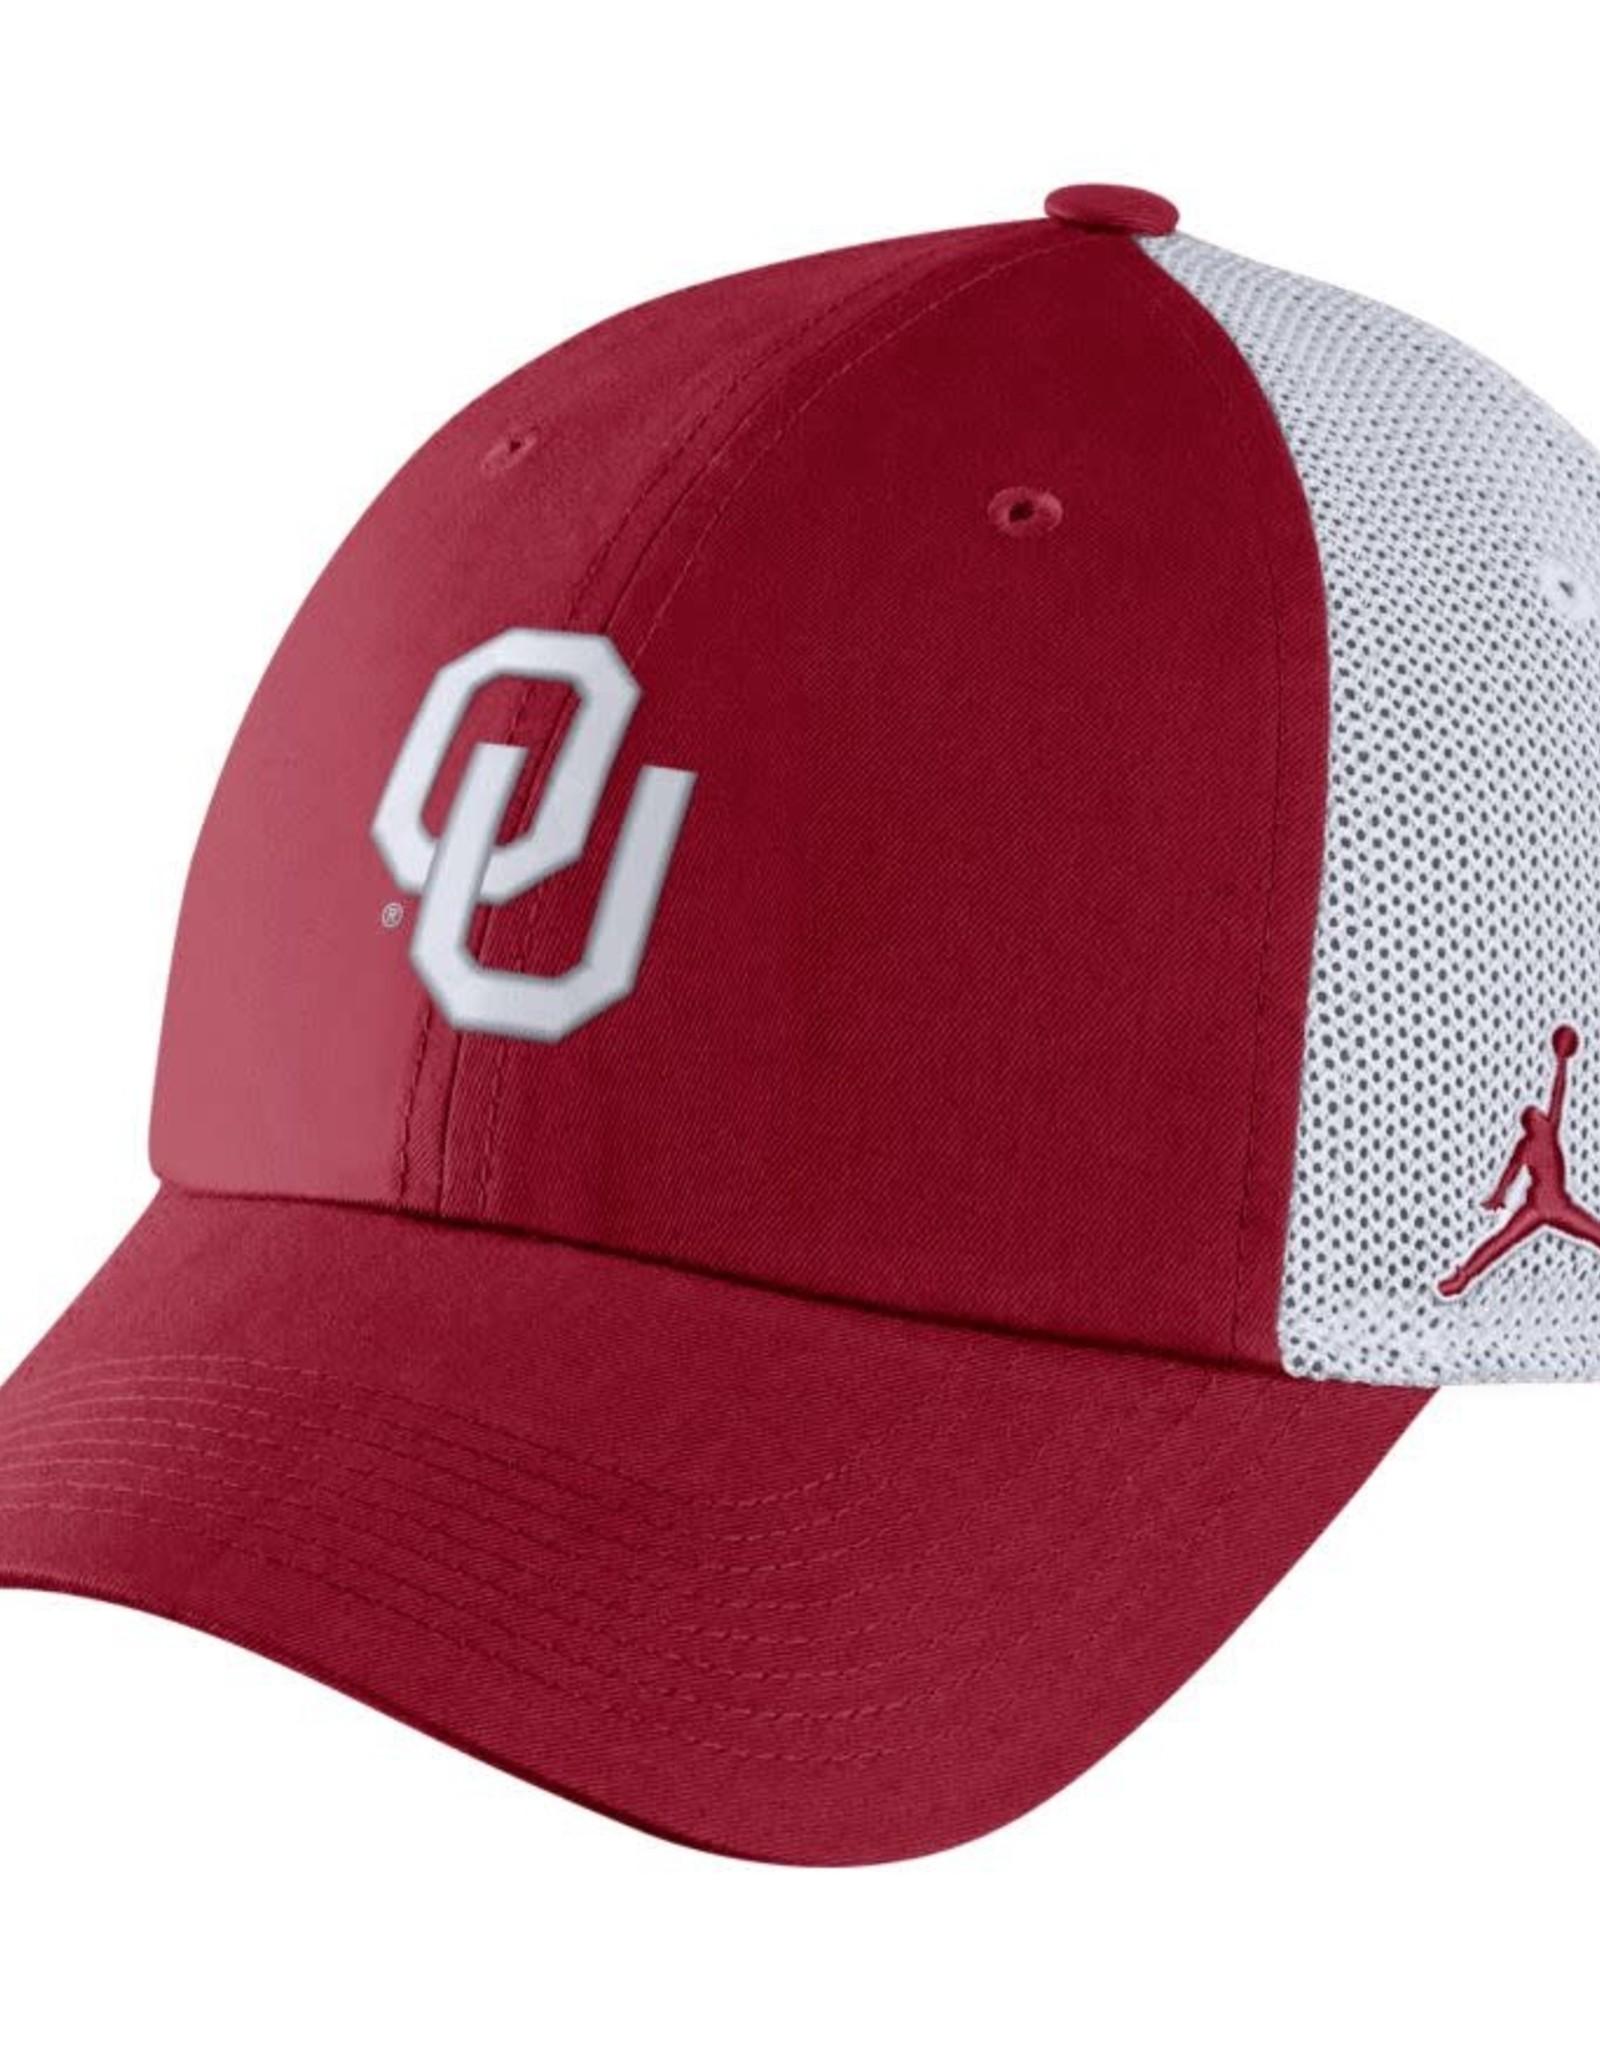 Jordan Jordan OU H86 Trucker Hat